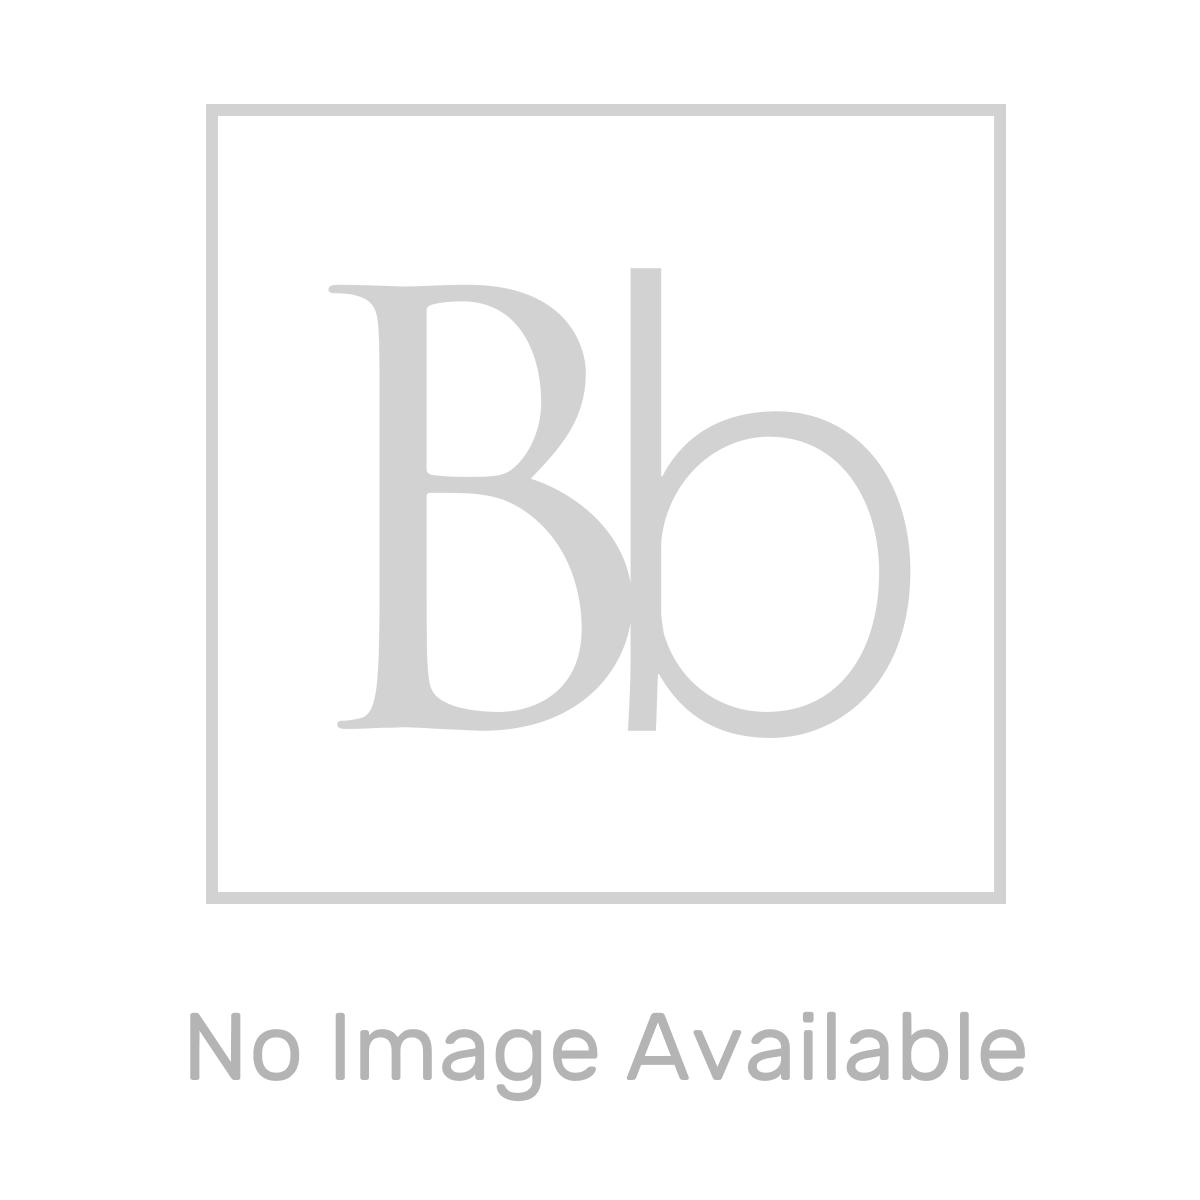 Frontline Aquaglass Mono Black Frosted Shower Screen Stabilising Bar